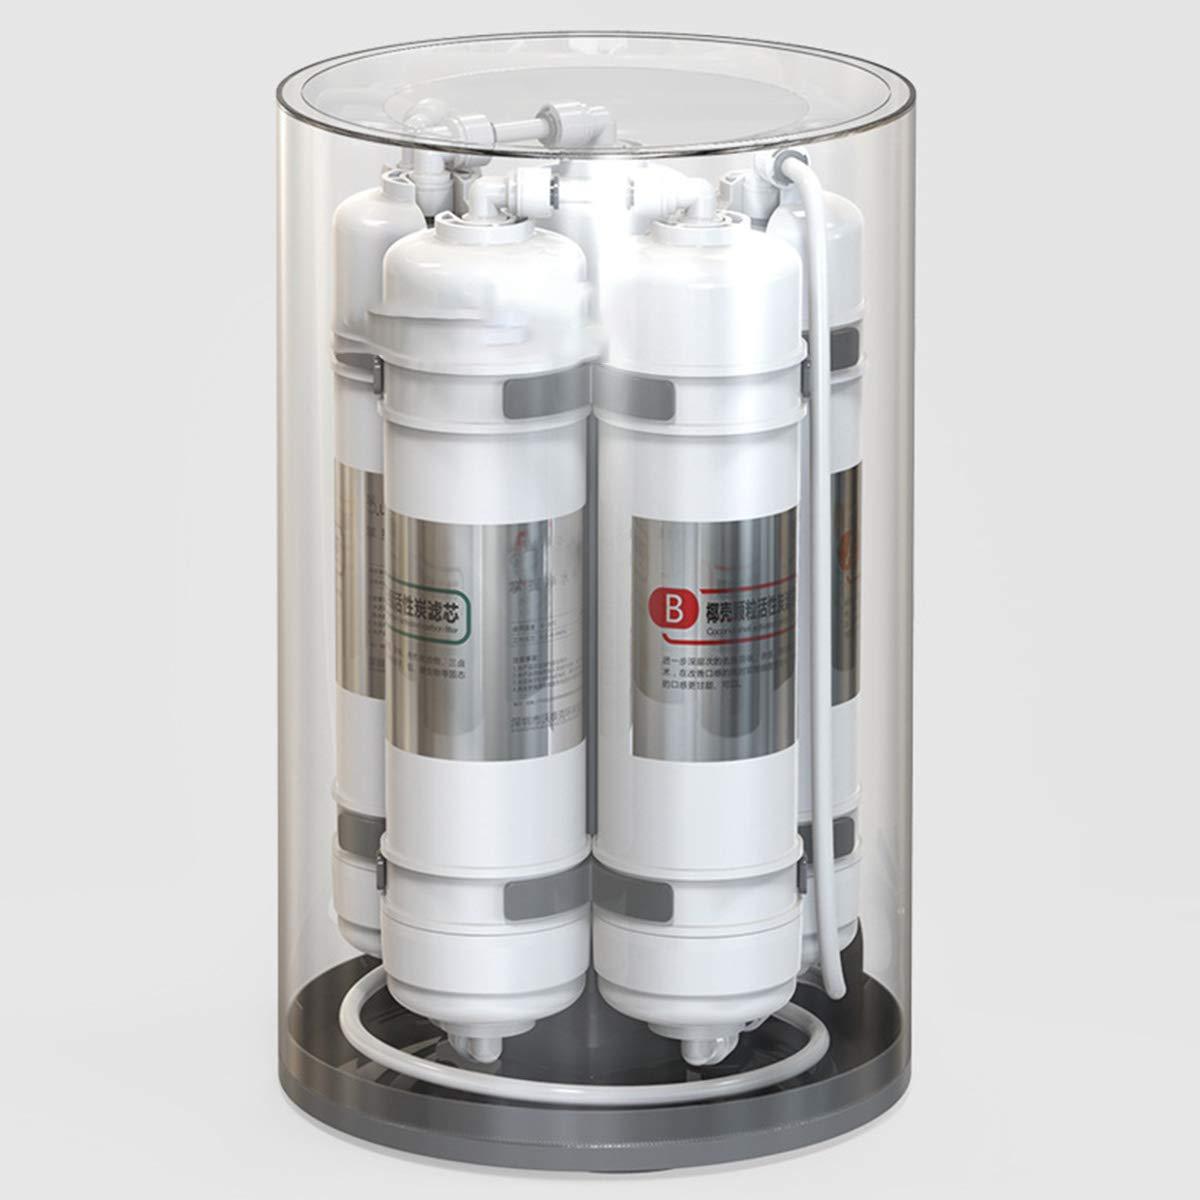 CCChaRLes Sistema De Filtro De Agua De 5 Etapas Grifos De Cocina Para El Hogar Purificador De Carbón Activado ...